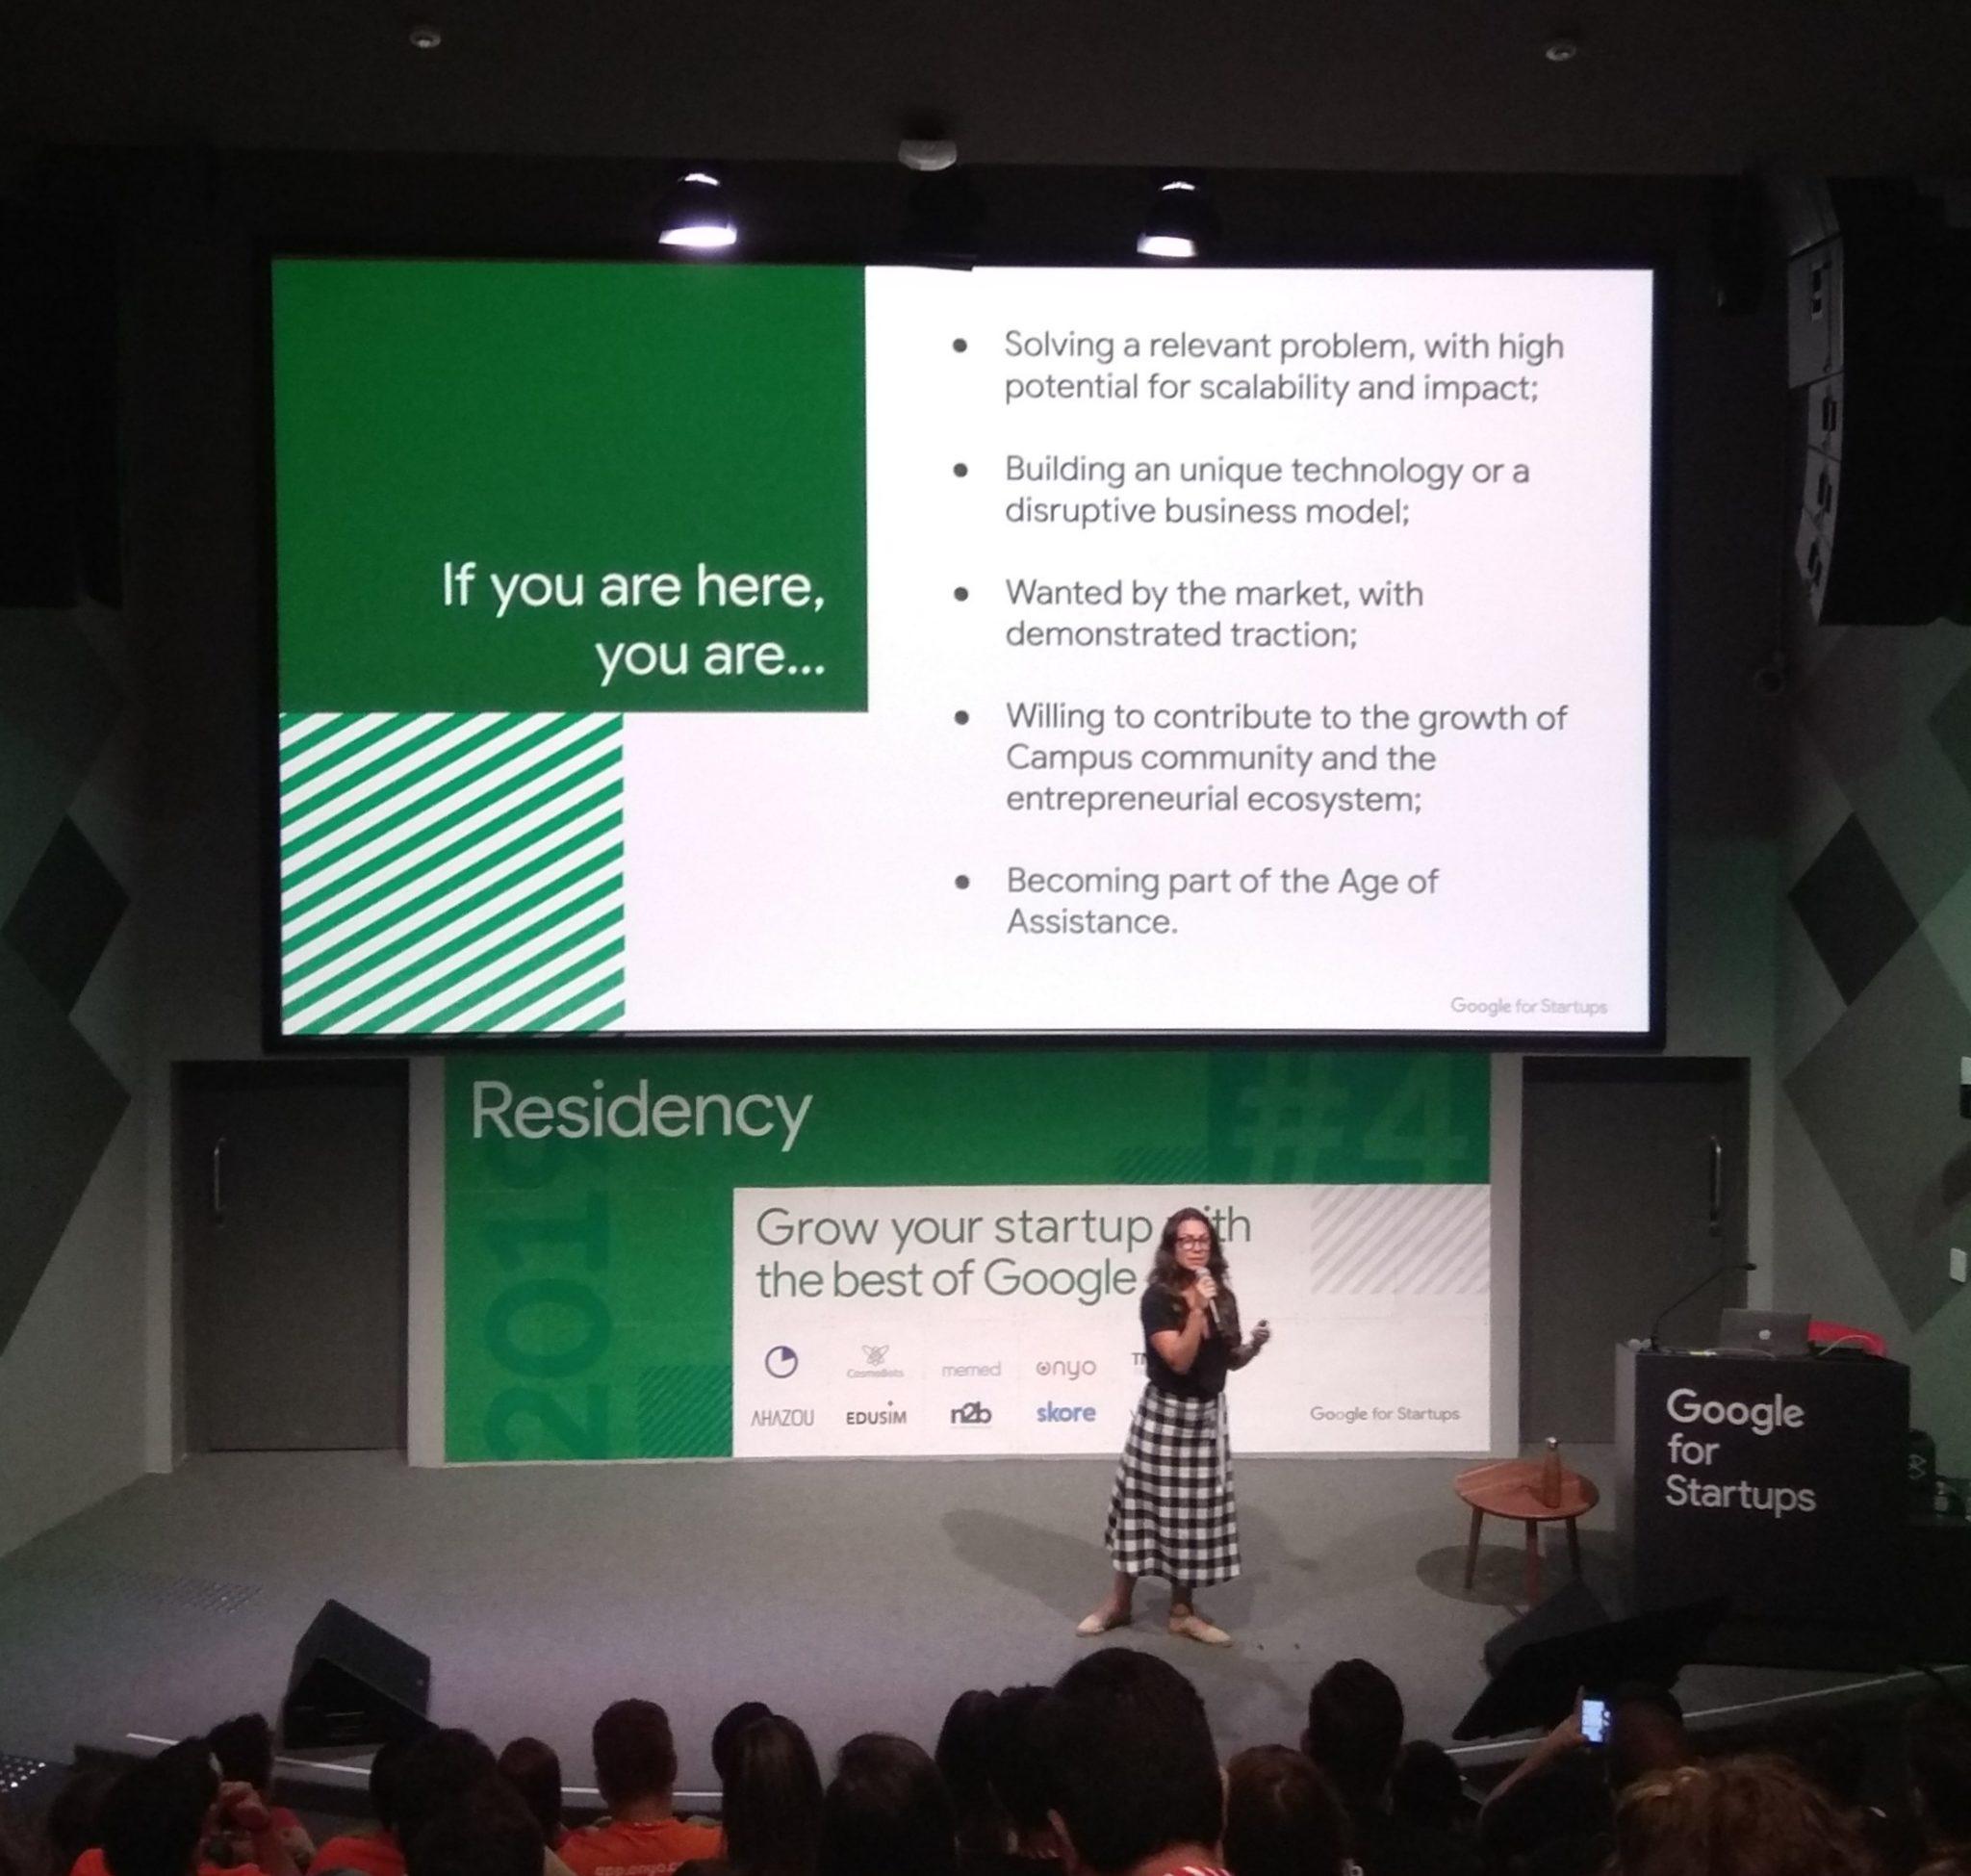 Welcome presentation at Google for Startups